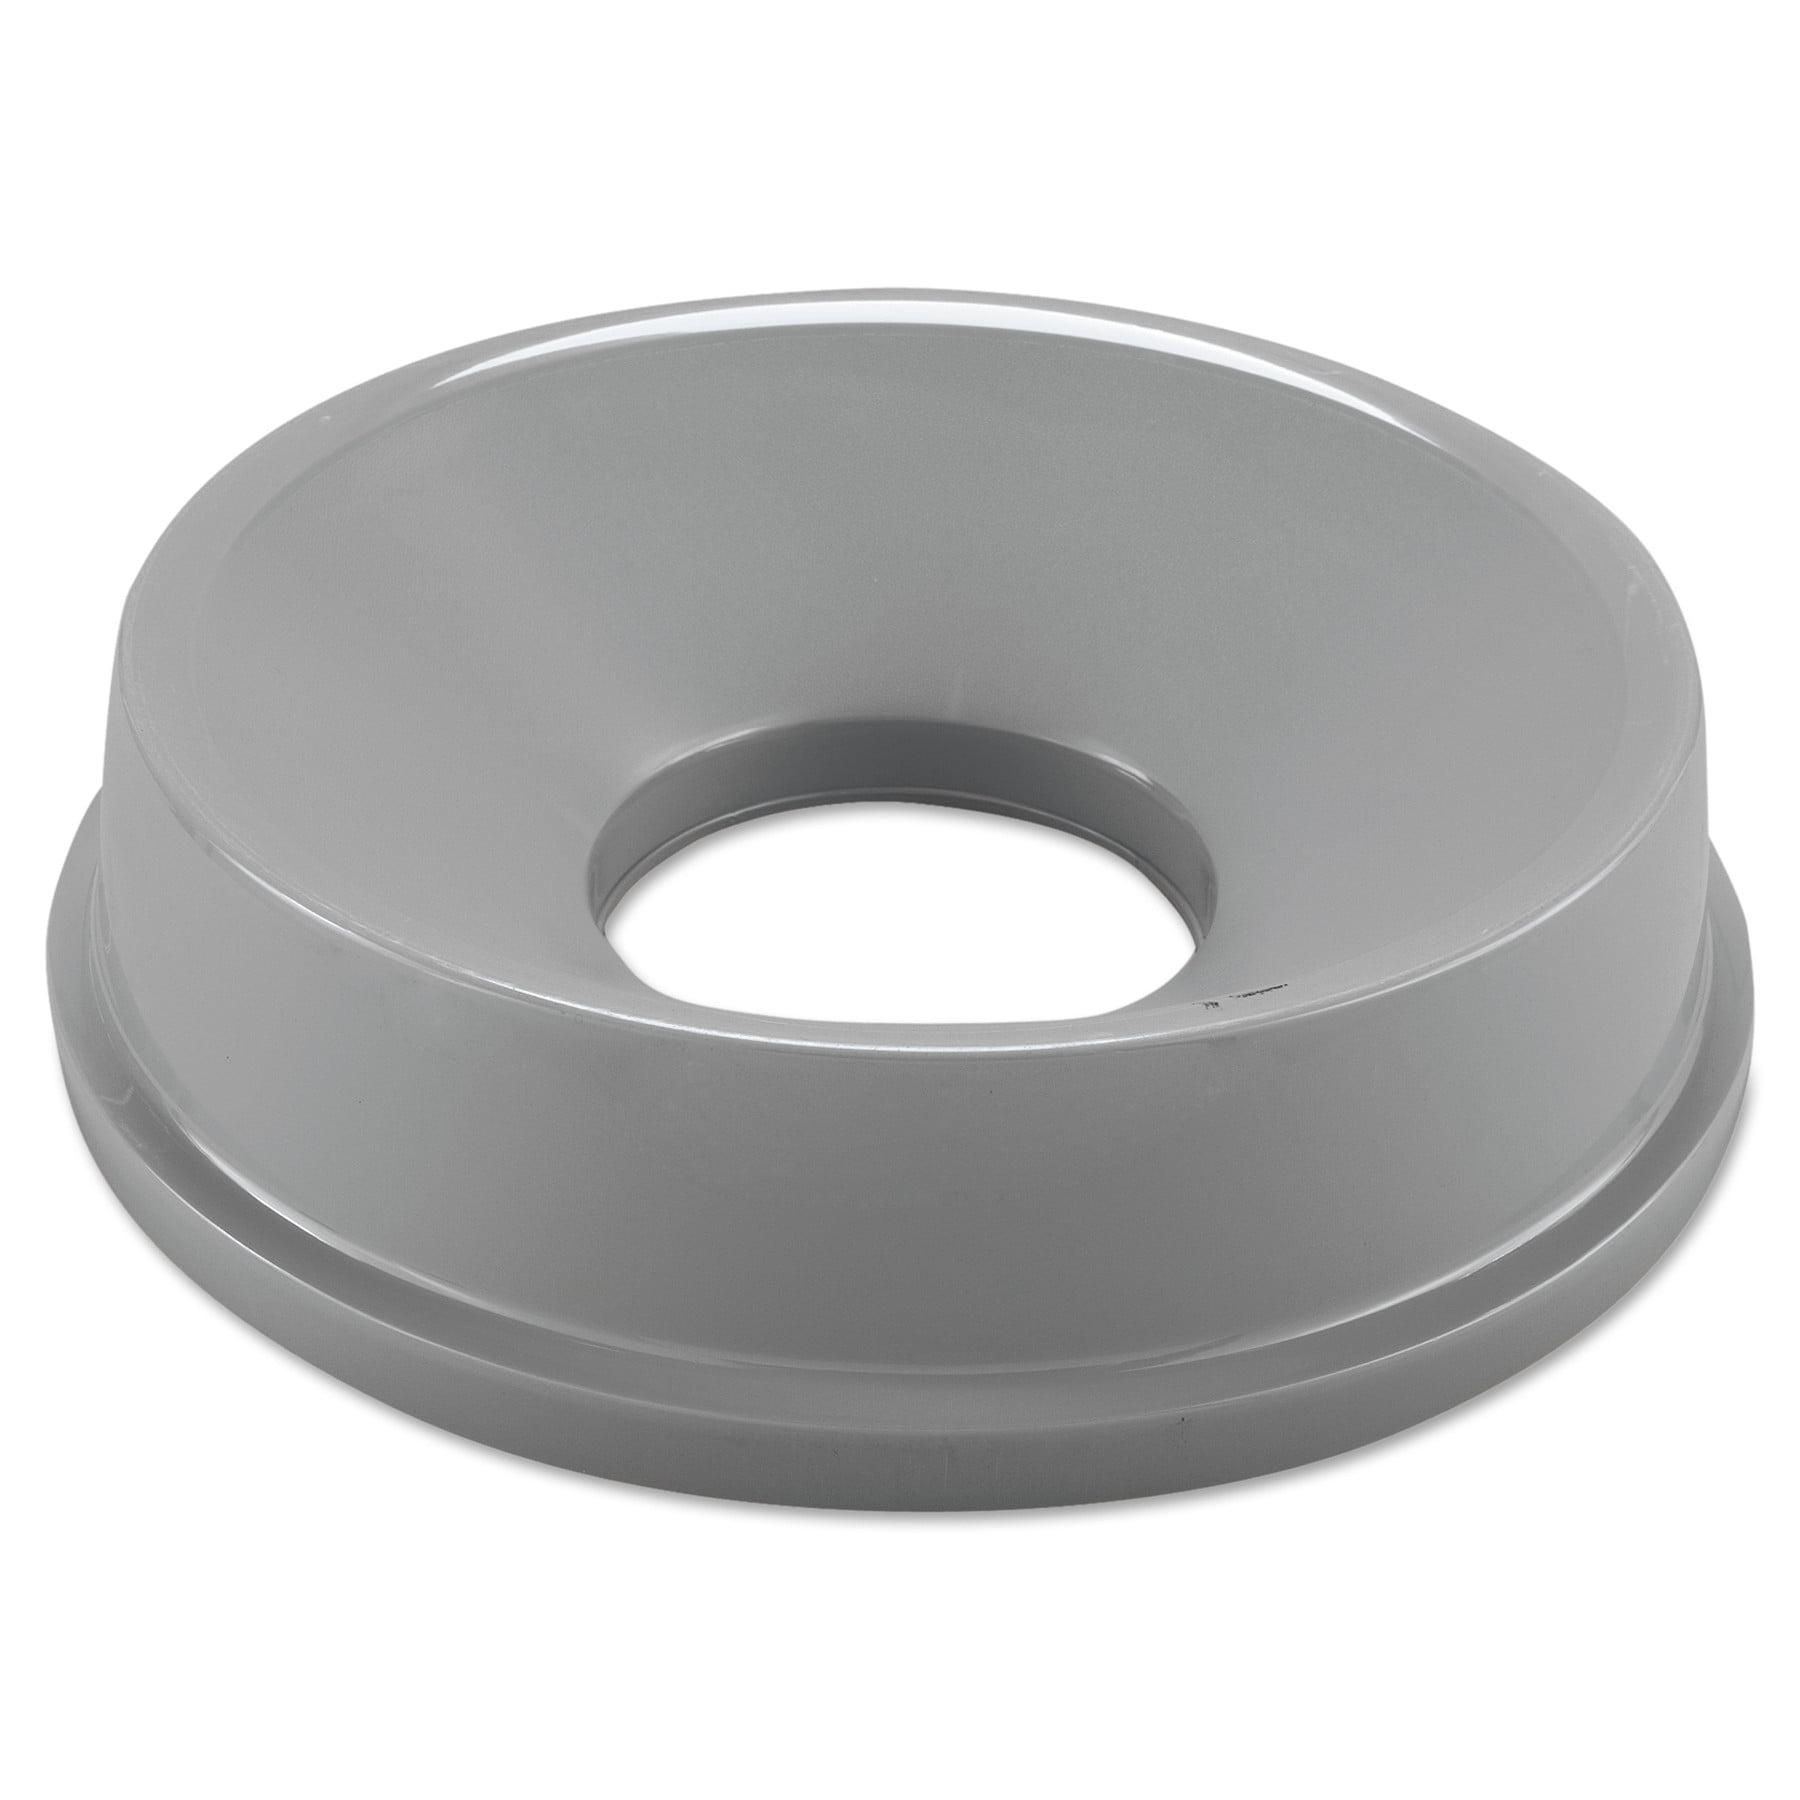 Rubbermaid Commercial Untouchable Funnel Top, Round, 16 1/4 Diameter, Gray